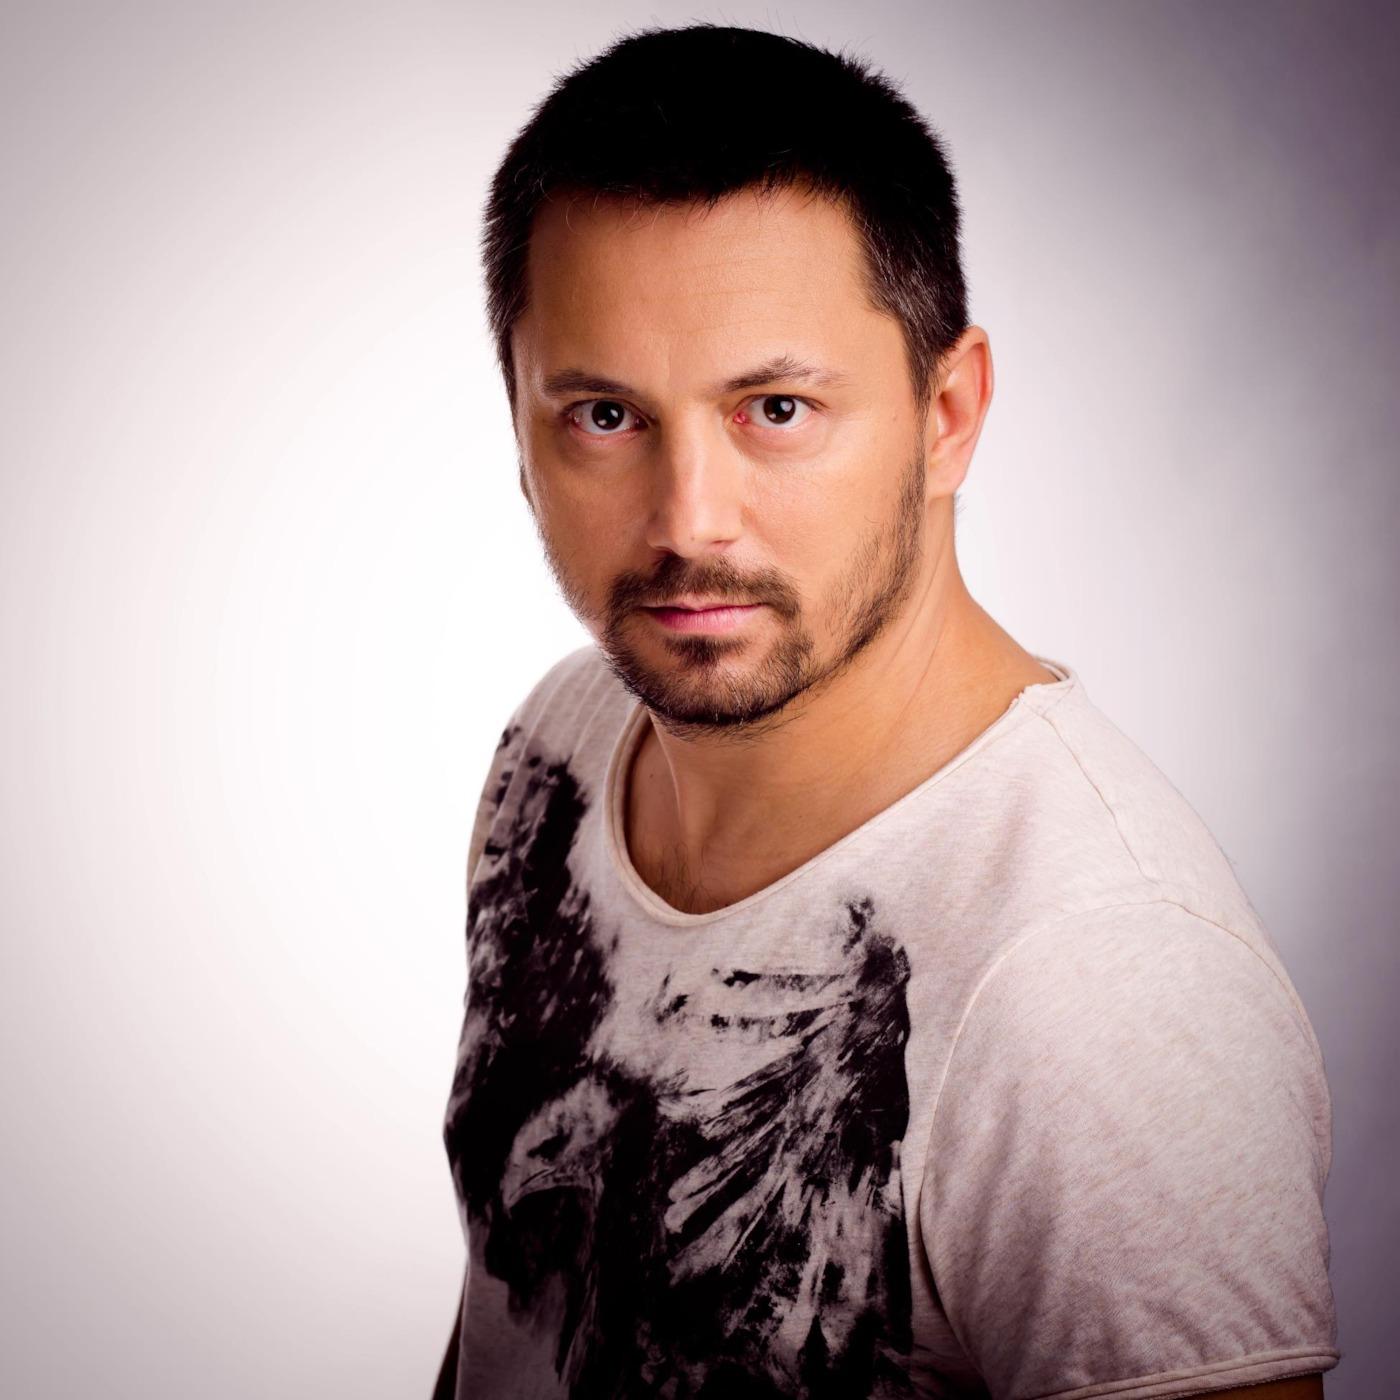 Cristian Kruger - Trippin' Grooves - DanceFM Romania